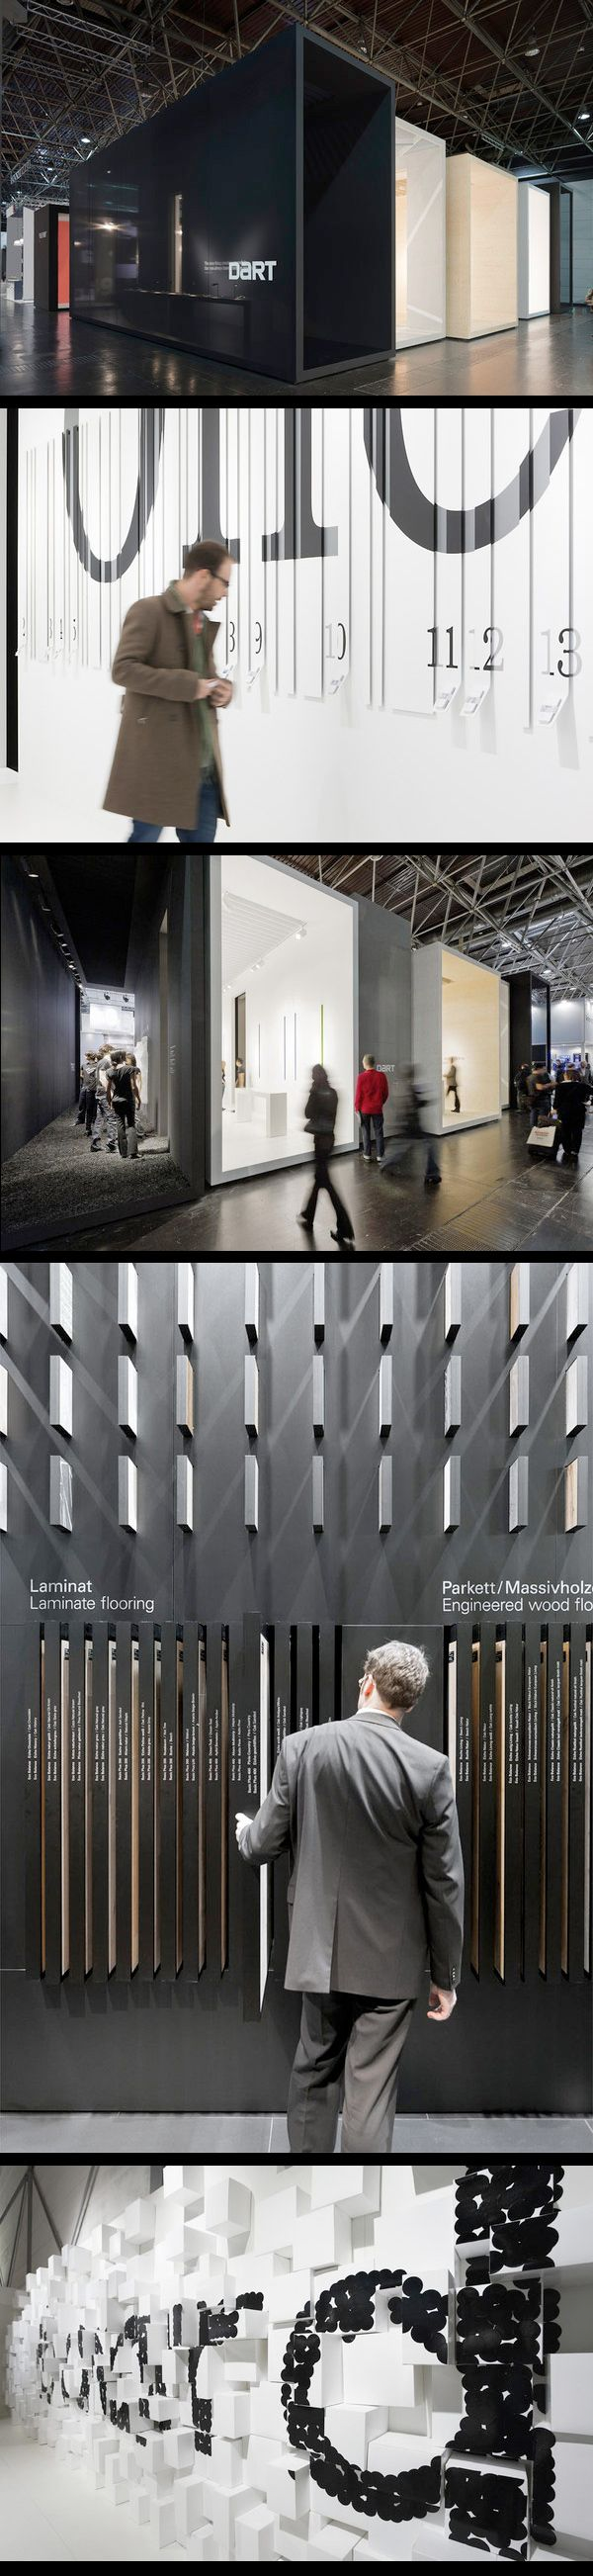 Fantastic applications of typography on varying surfaces by Düsseldorf-based D'art Design Gruppe (EuroShop 2011)